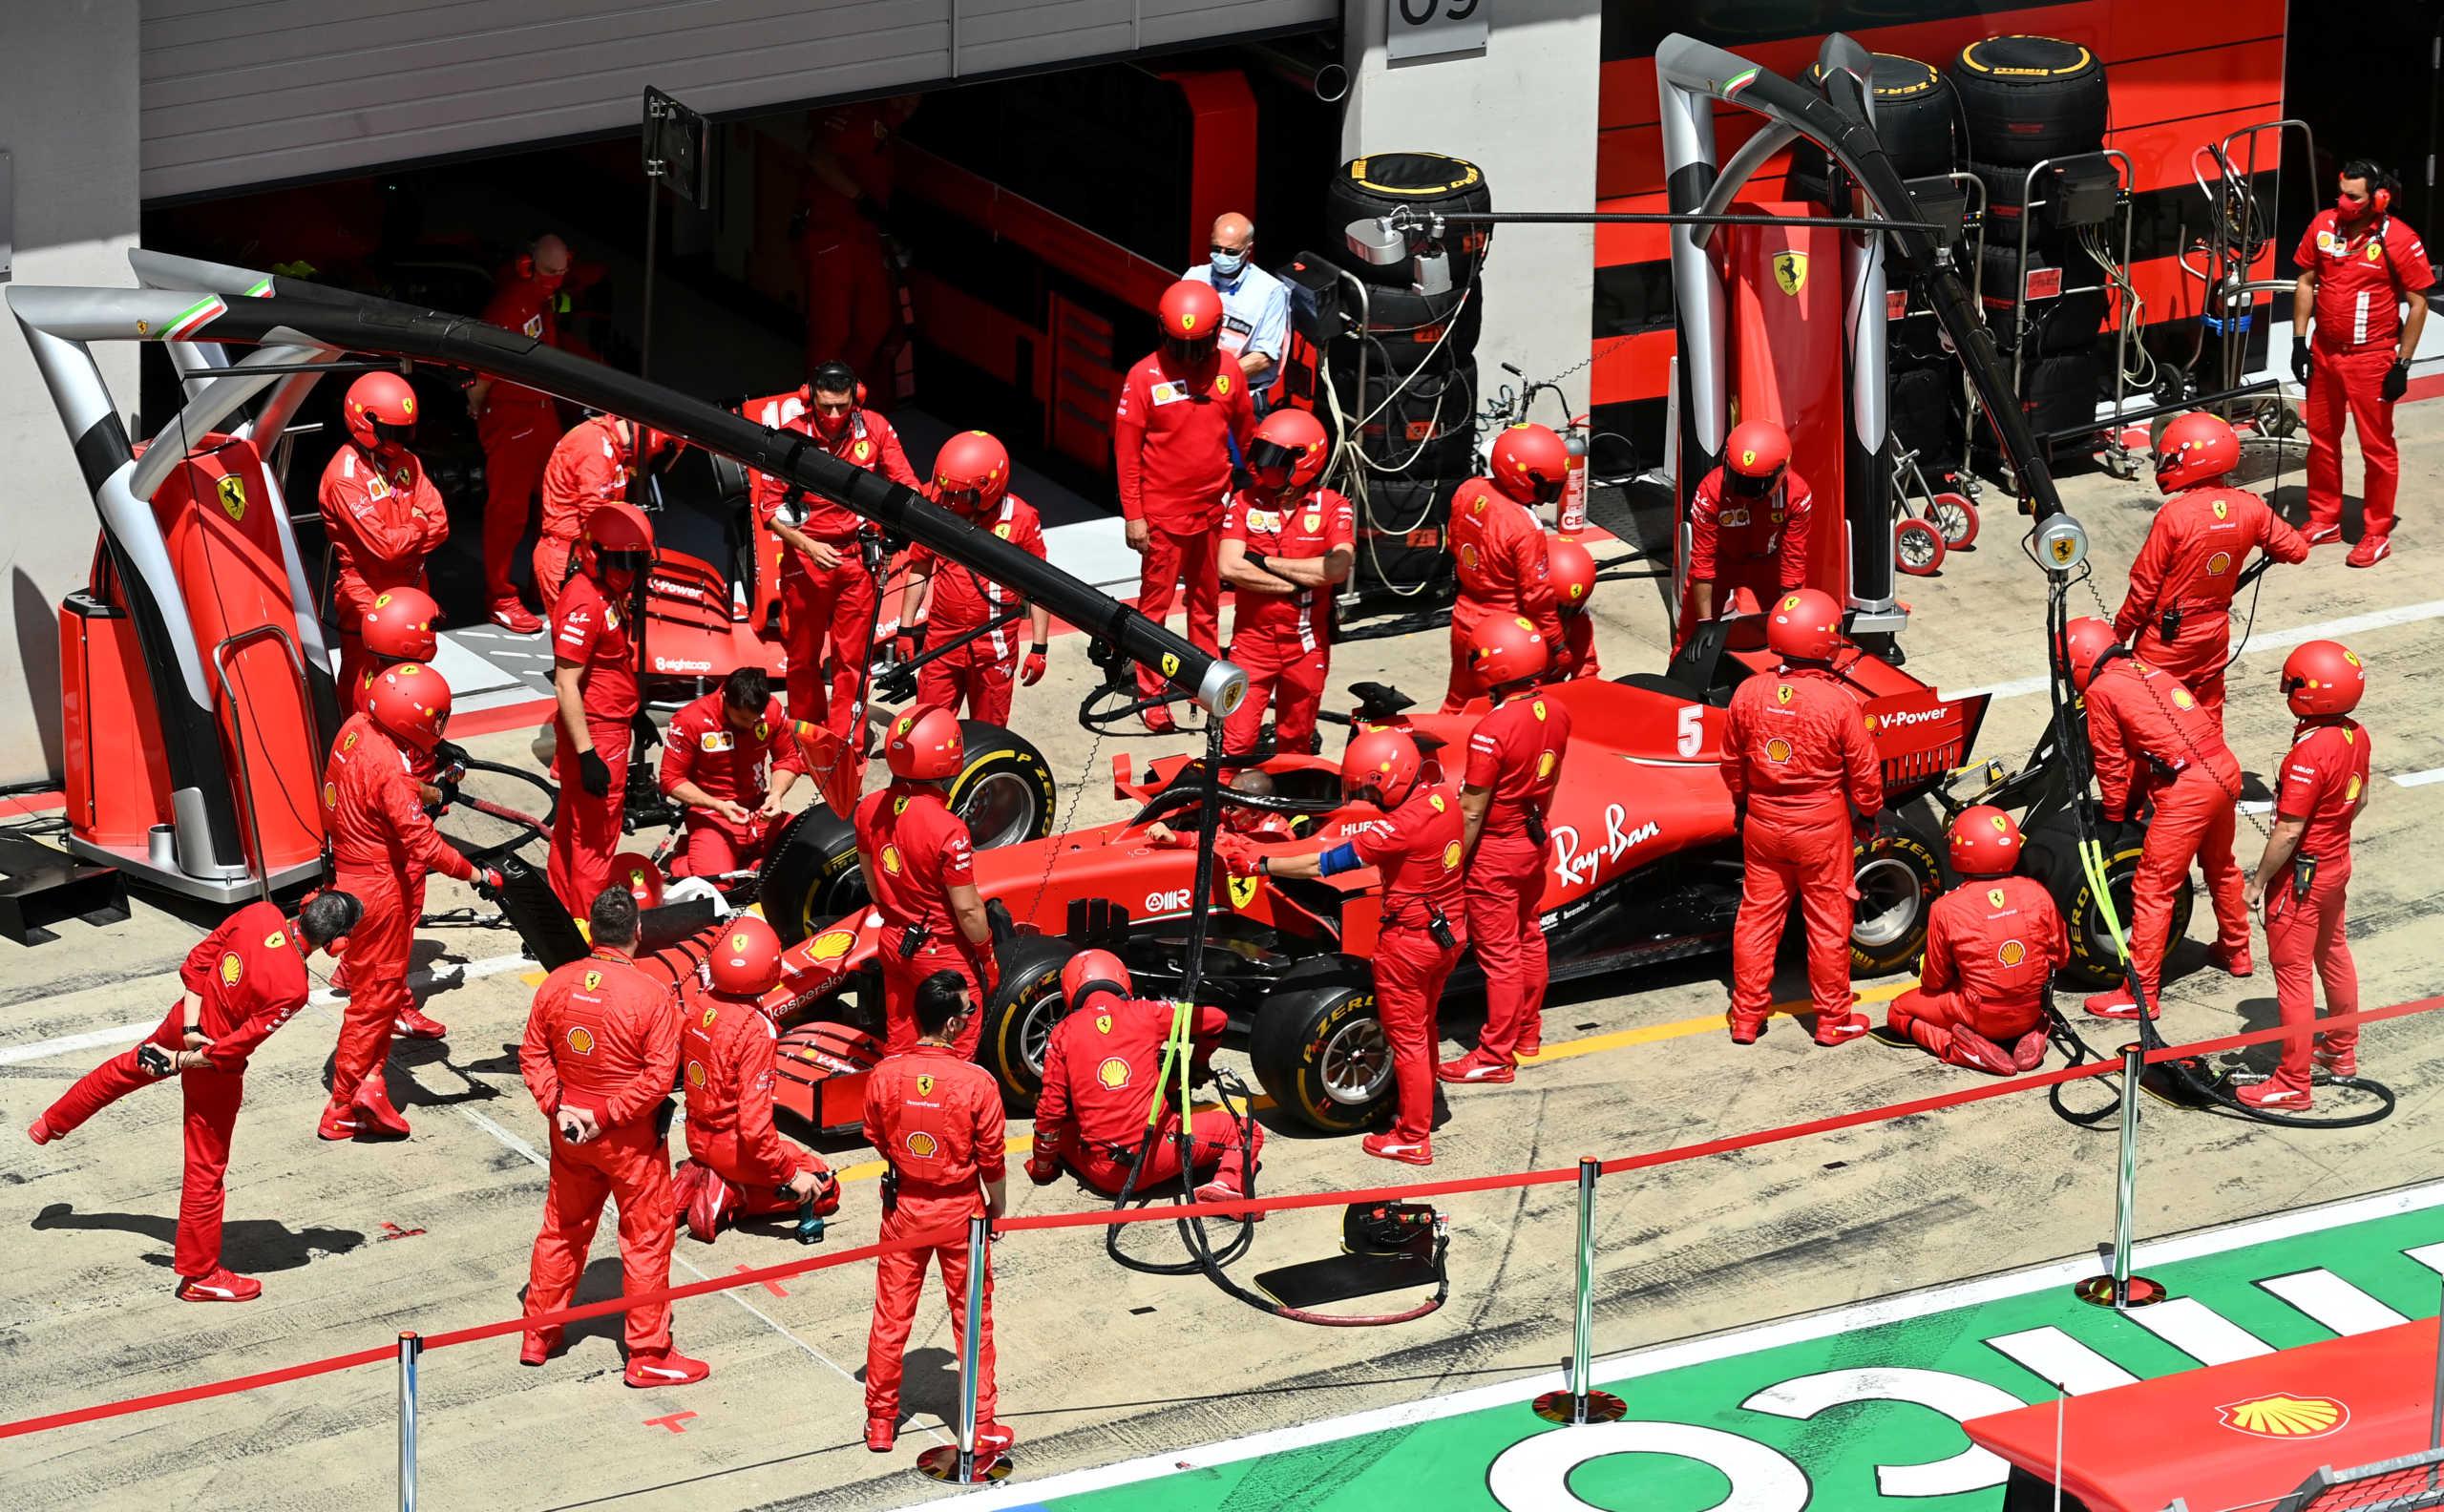 Formula 1: Απίστευτη γκάφα στη Ferrari! Τράκαραν μεταξύ τους Φέτελ και Λεκλέρκ (video)